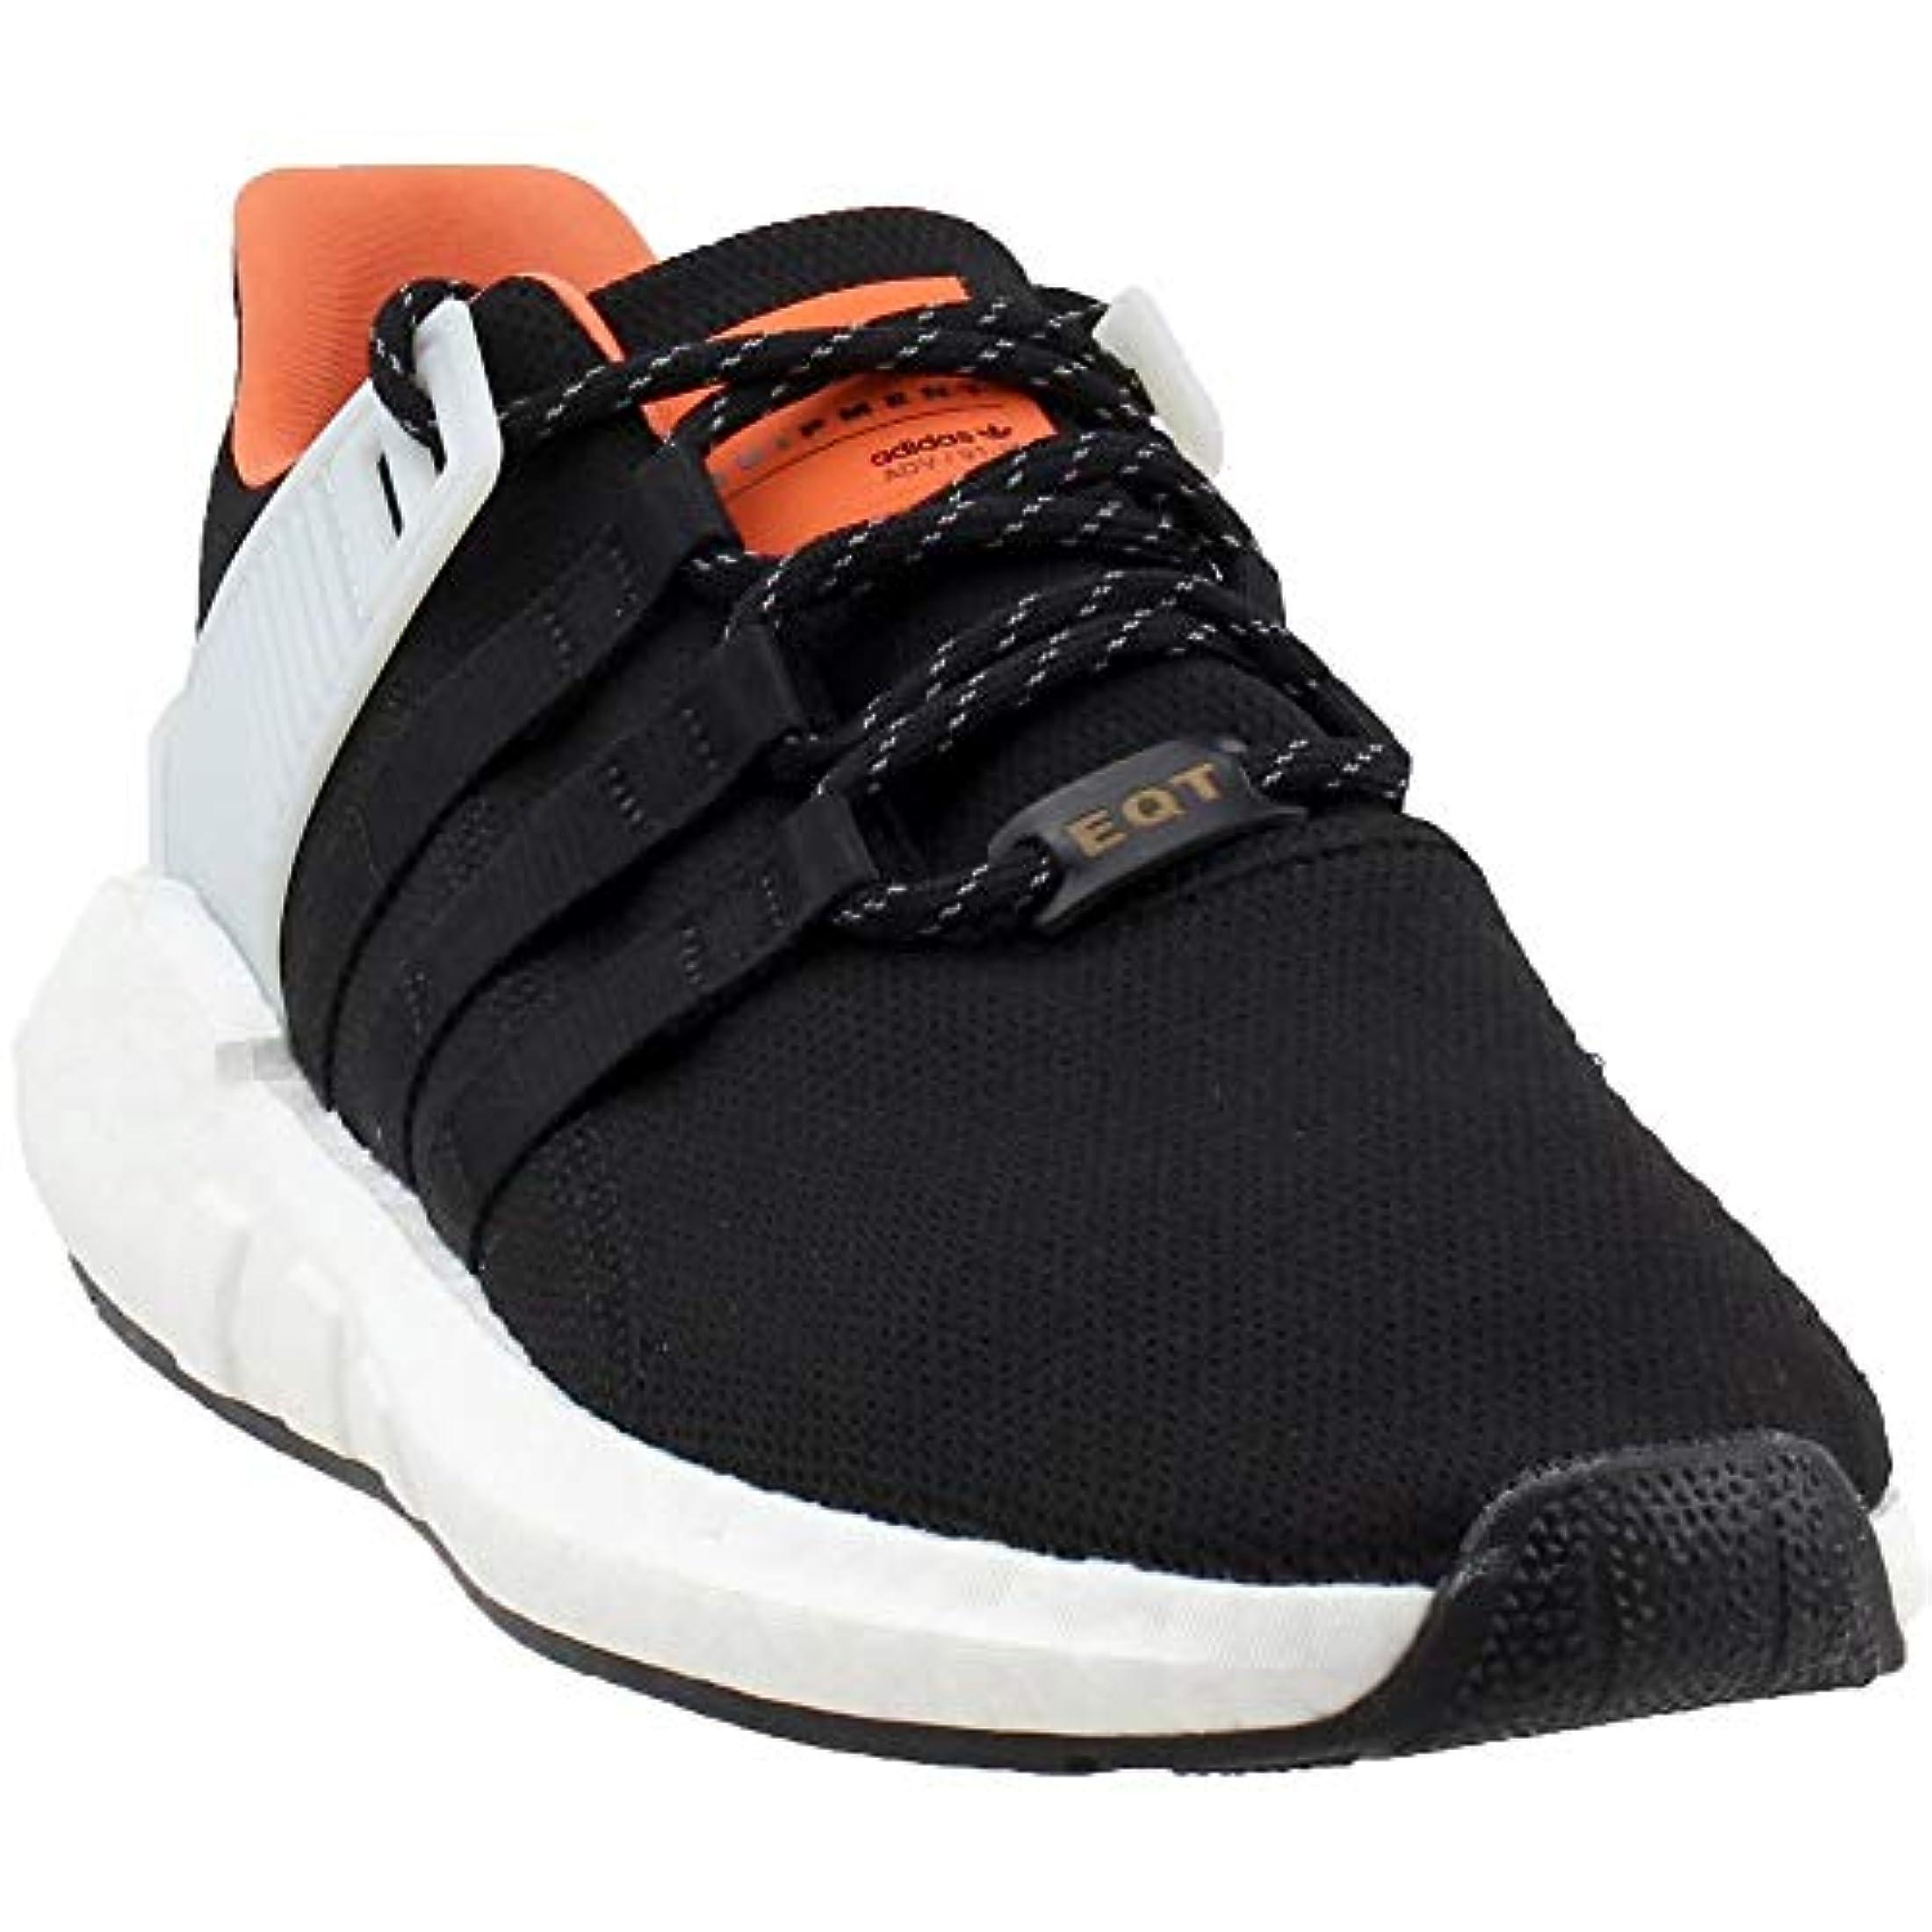 new concept 18a90 3d0fb adidas Men s Originals EQT Support 93 17 Shoes (Core Black, Black, White -  Size 9.5)